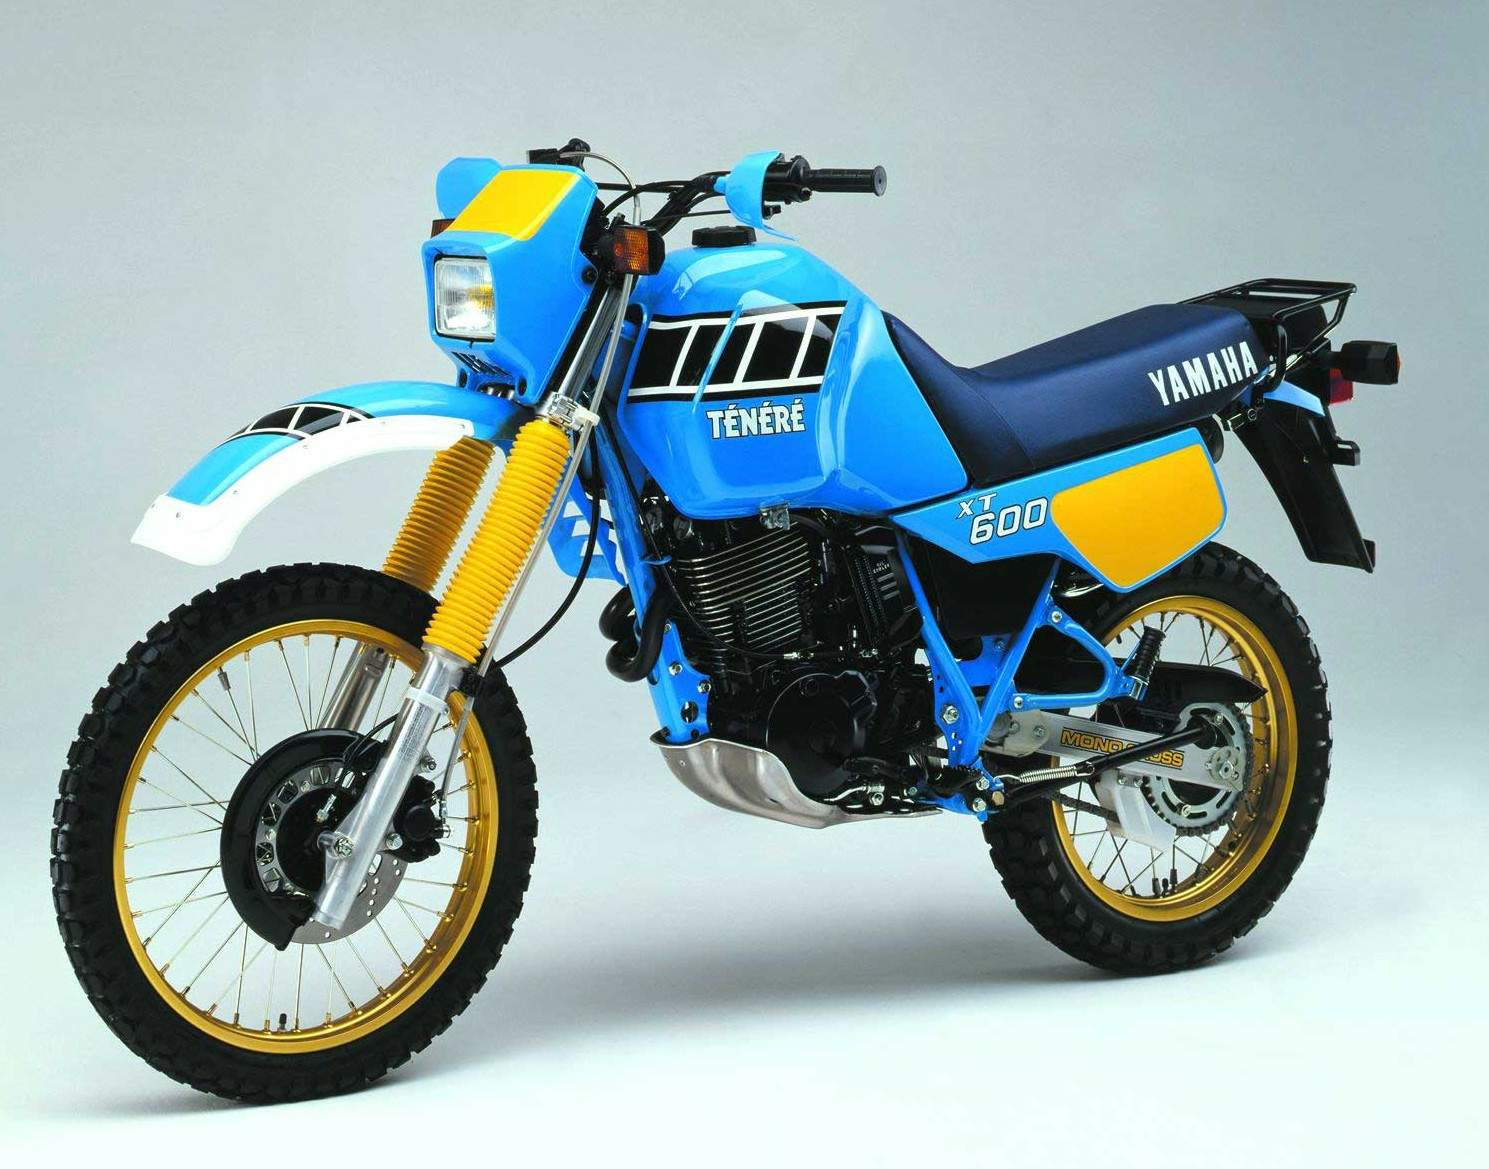 Мотоцикл yamaha xt 600 z tenere 1983 фото